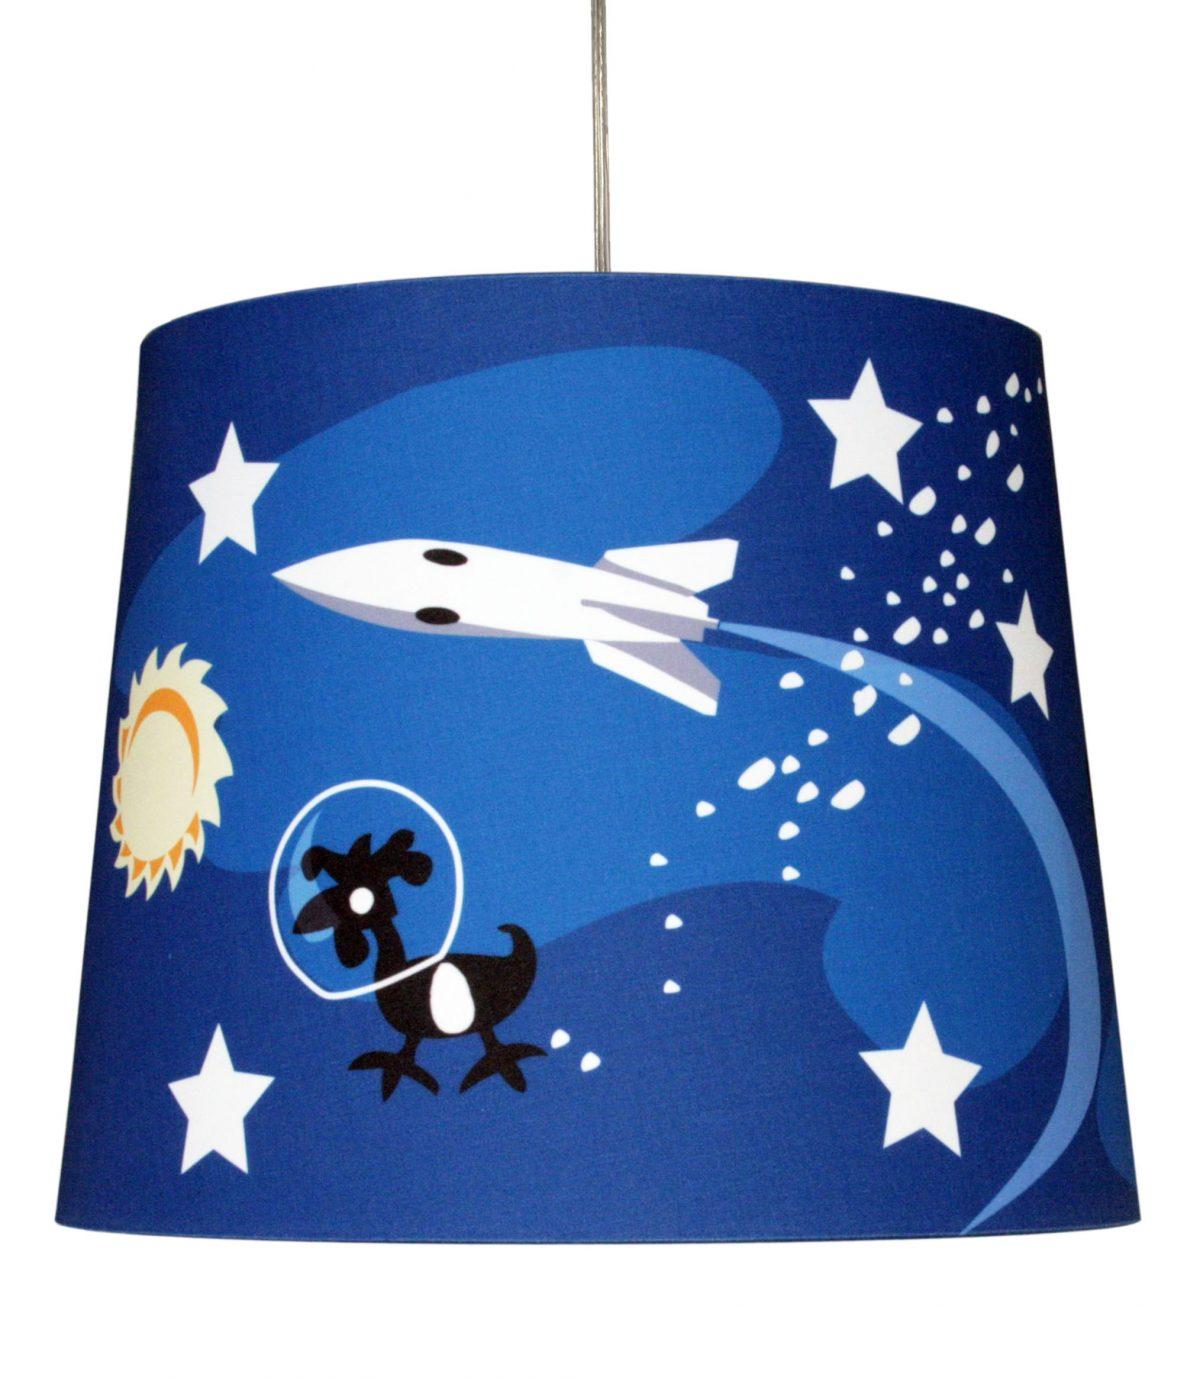 Hanglamp Kinderkamer Vreemde Vogels Space